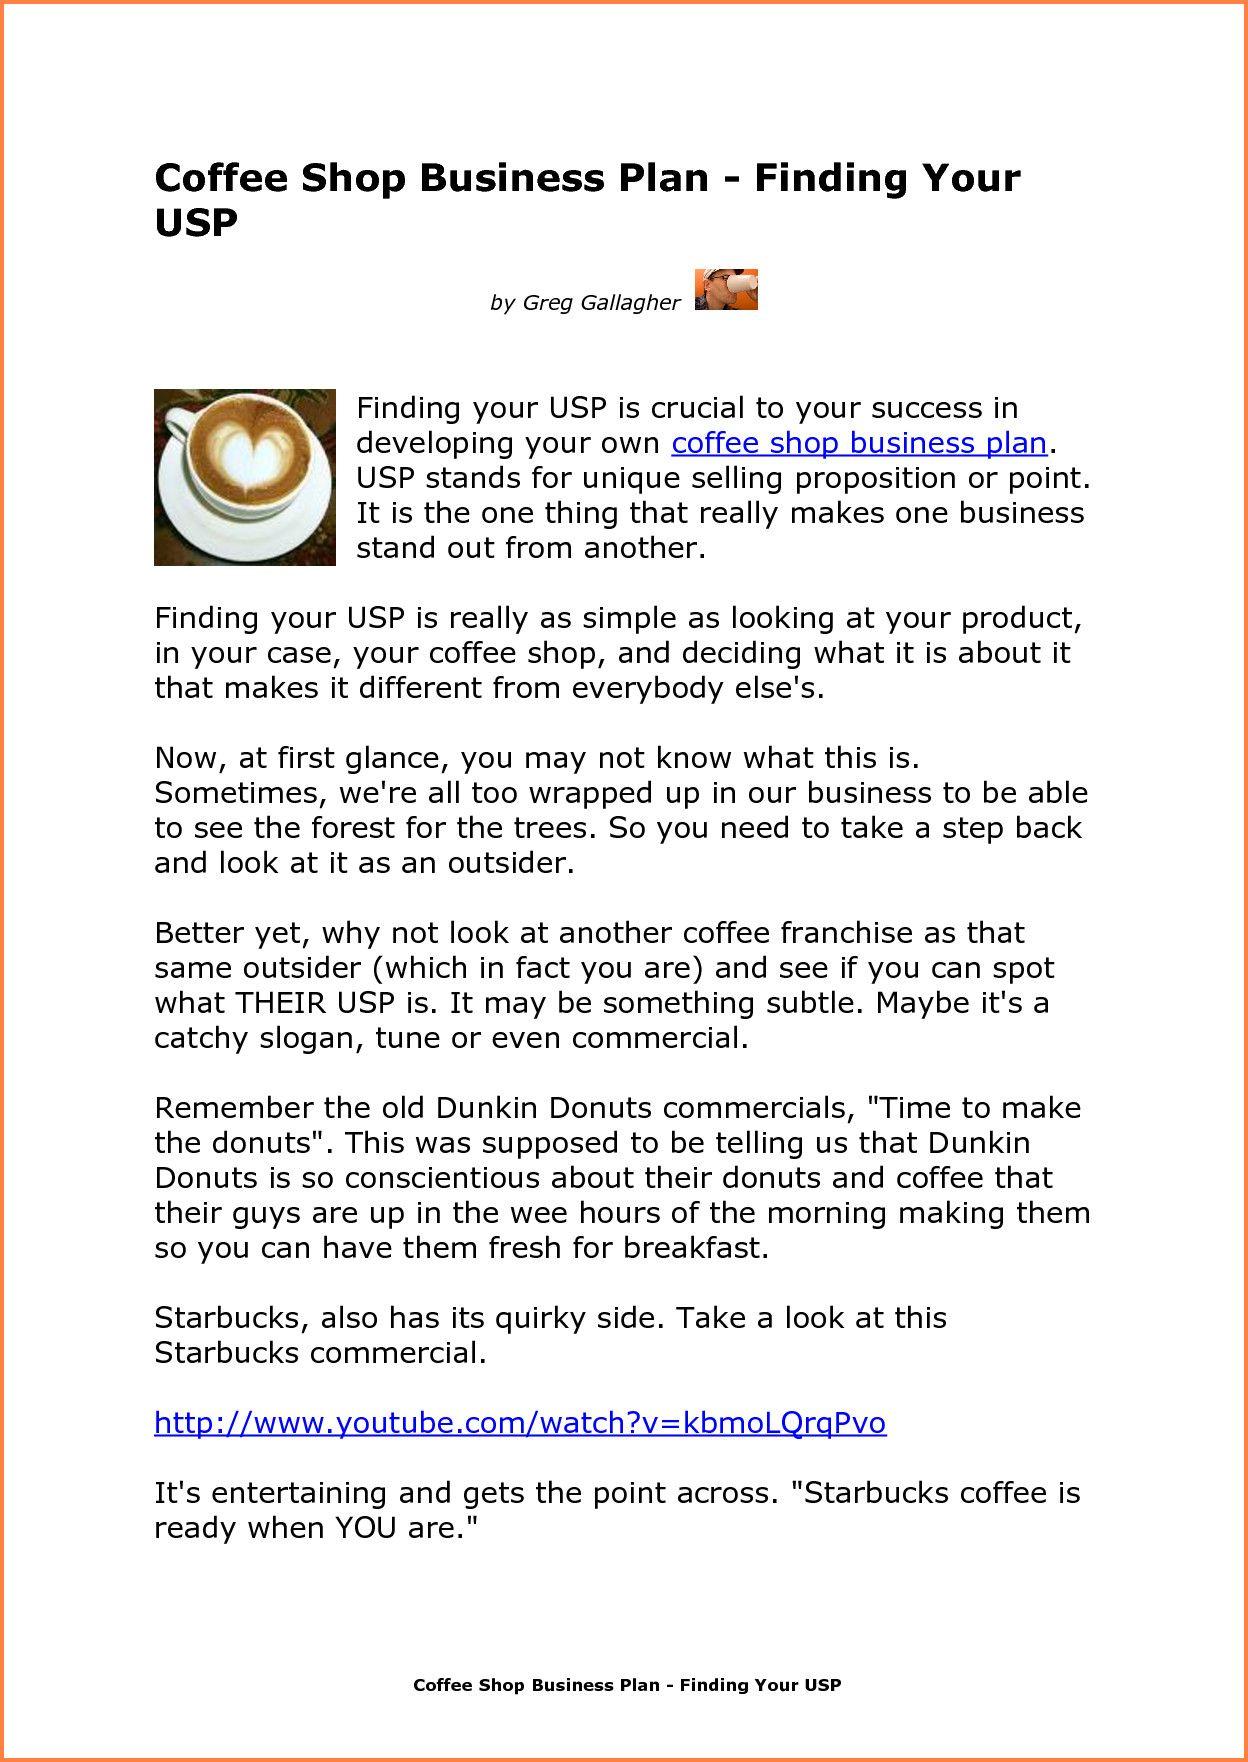 Coffee Shop Business Plan Template Fresh 8 Coffee Shop